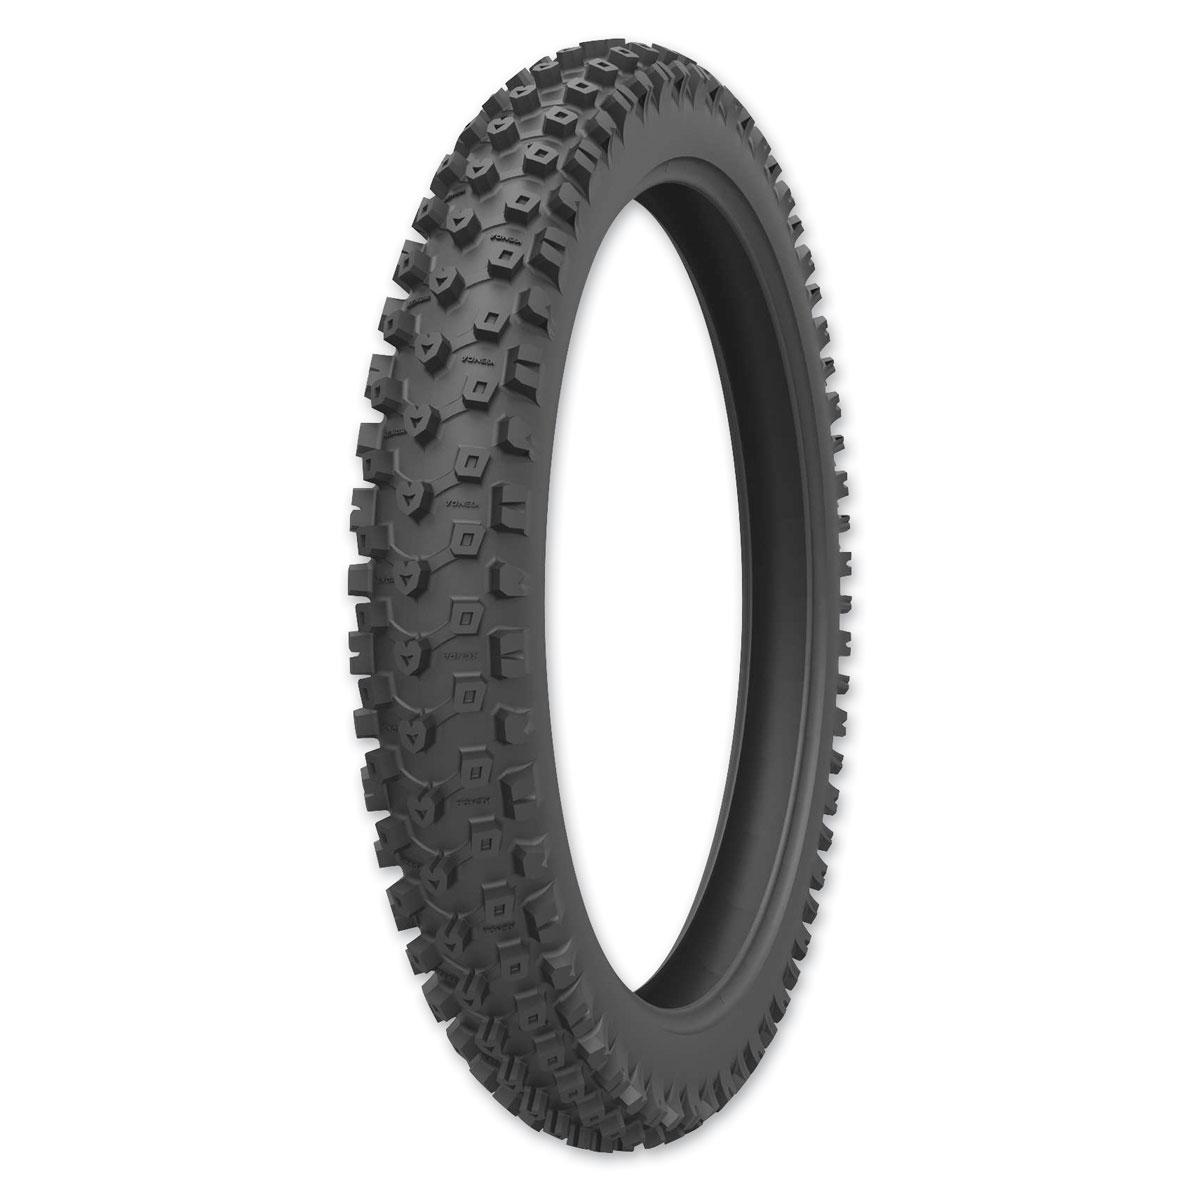 Kenda Tires K772 Parker 80/100-21 Front Tire